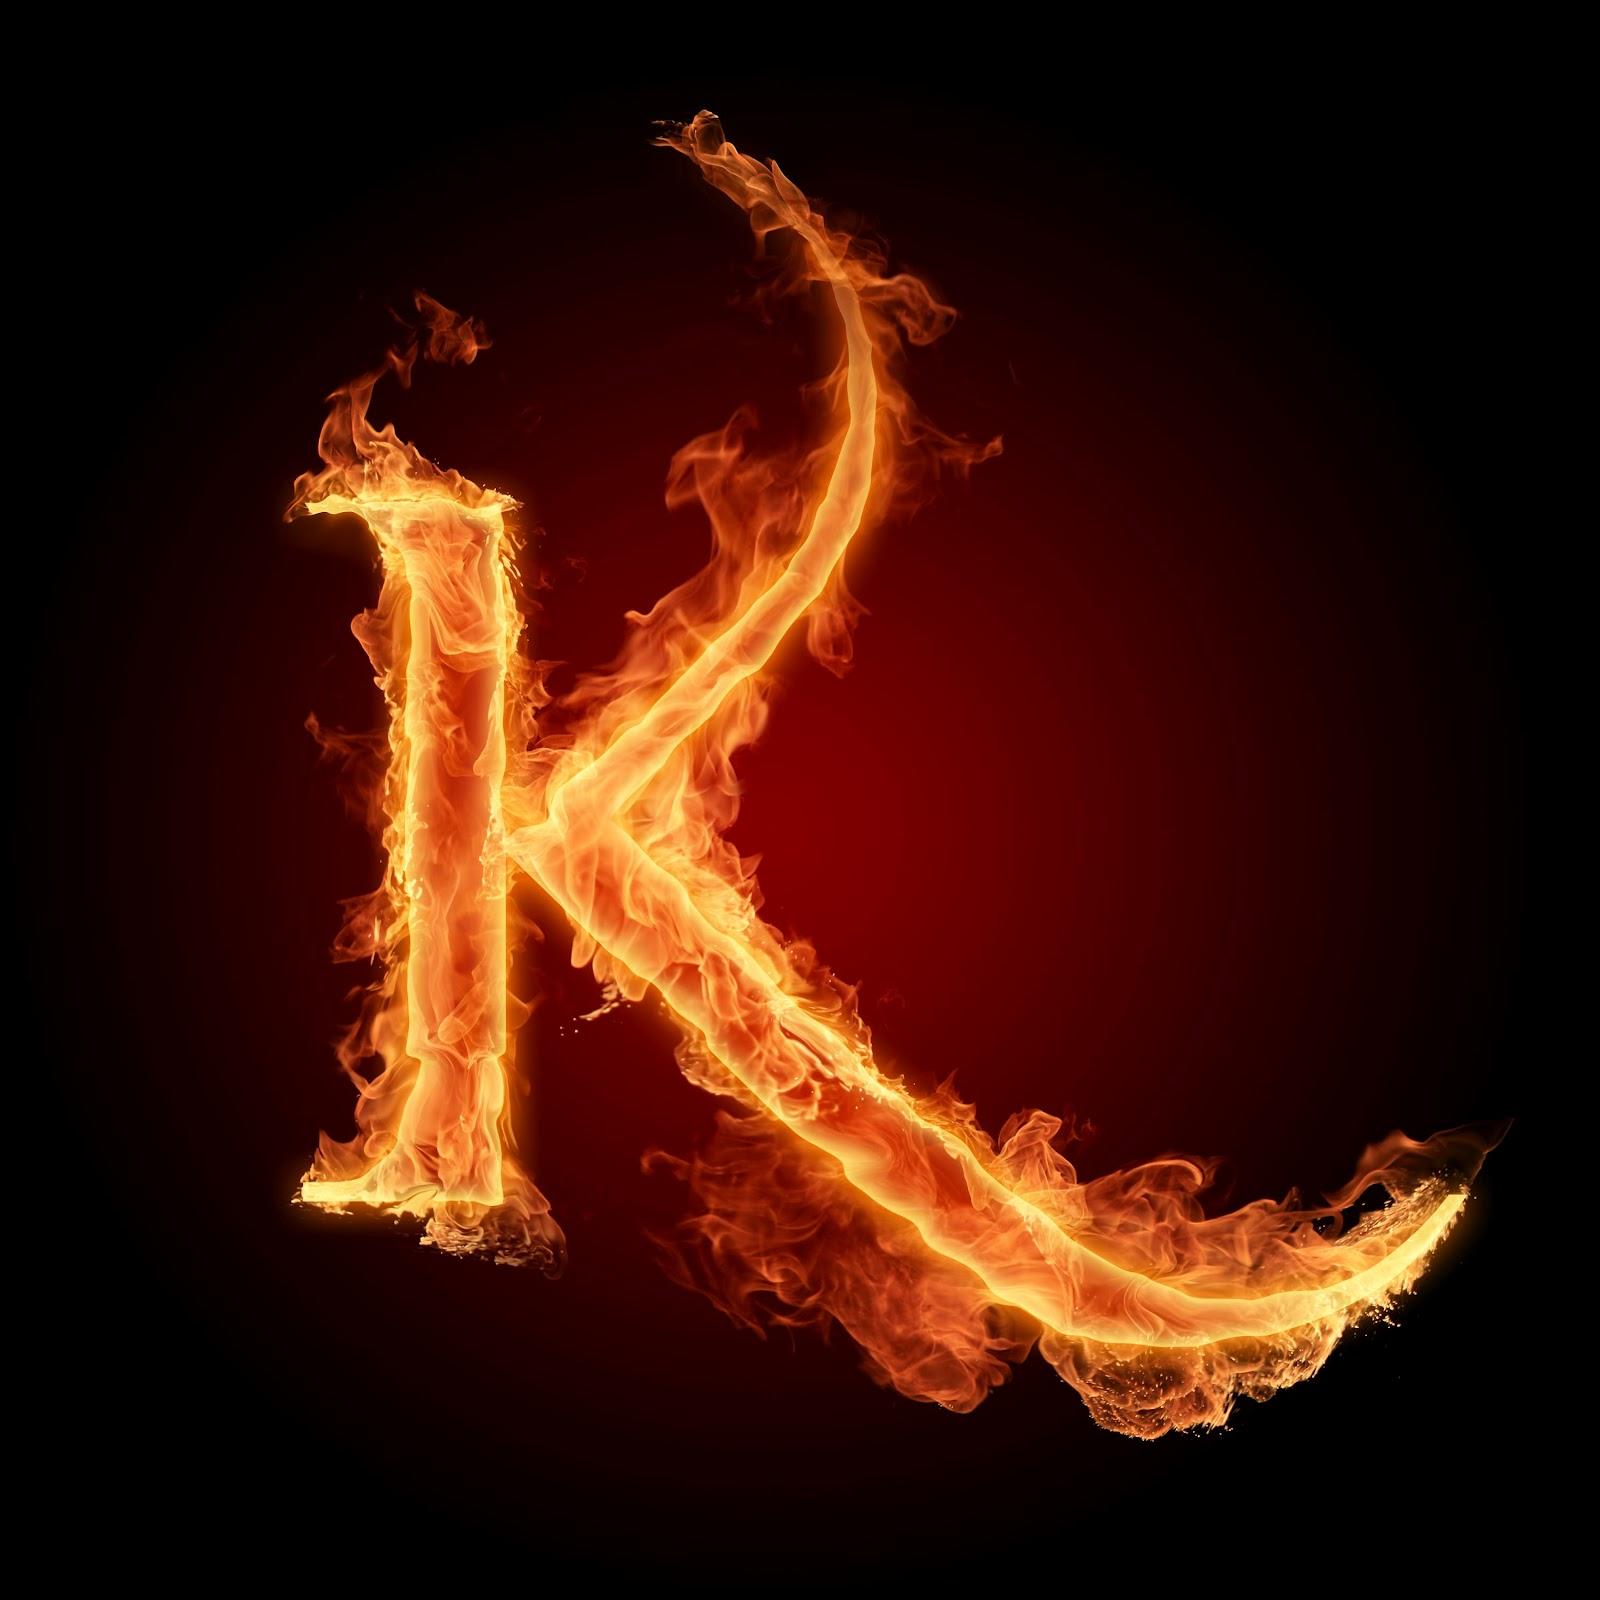 http://1.bp.blogspot.com/-MUB_i5q5wbA/UB0yiwmv9MI/AAAAAAAAAKE/549Uz_K3_-g/s1600/Burning%2BAlphabet%2BWallpaper%2BK.jpg